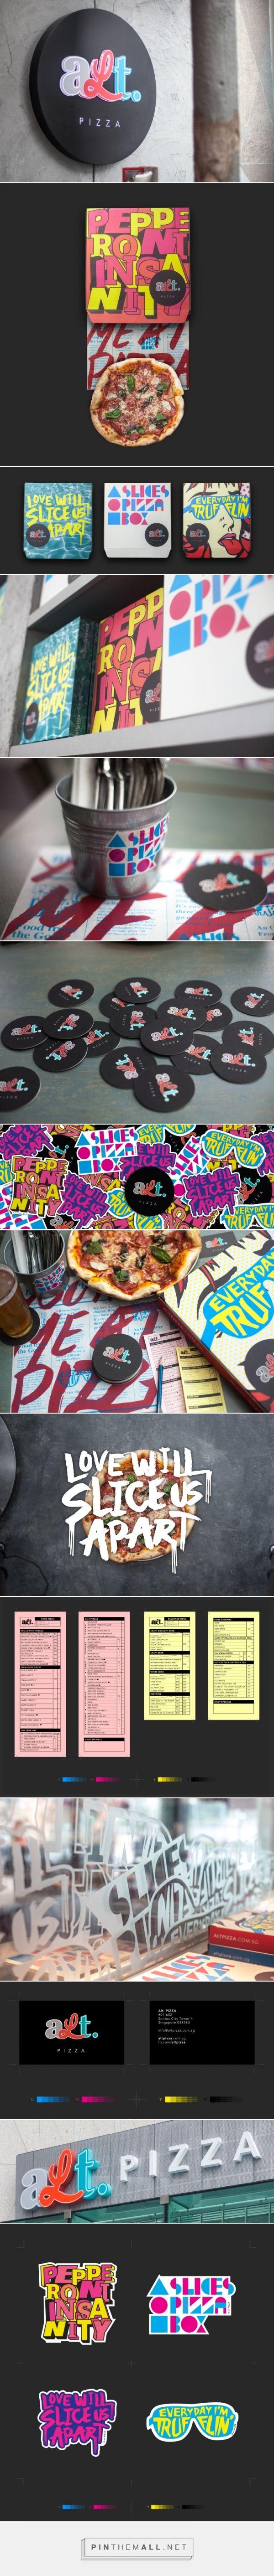 ALT. Pizza Branding by Bravo »  Retail Design Blog - created via https://pinthemall.net